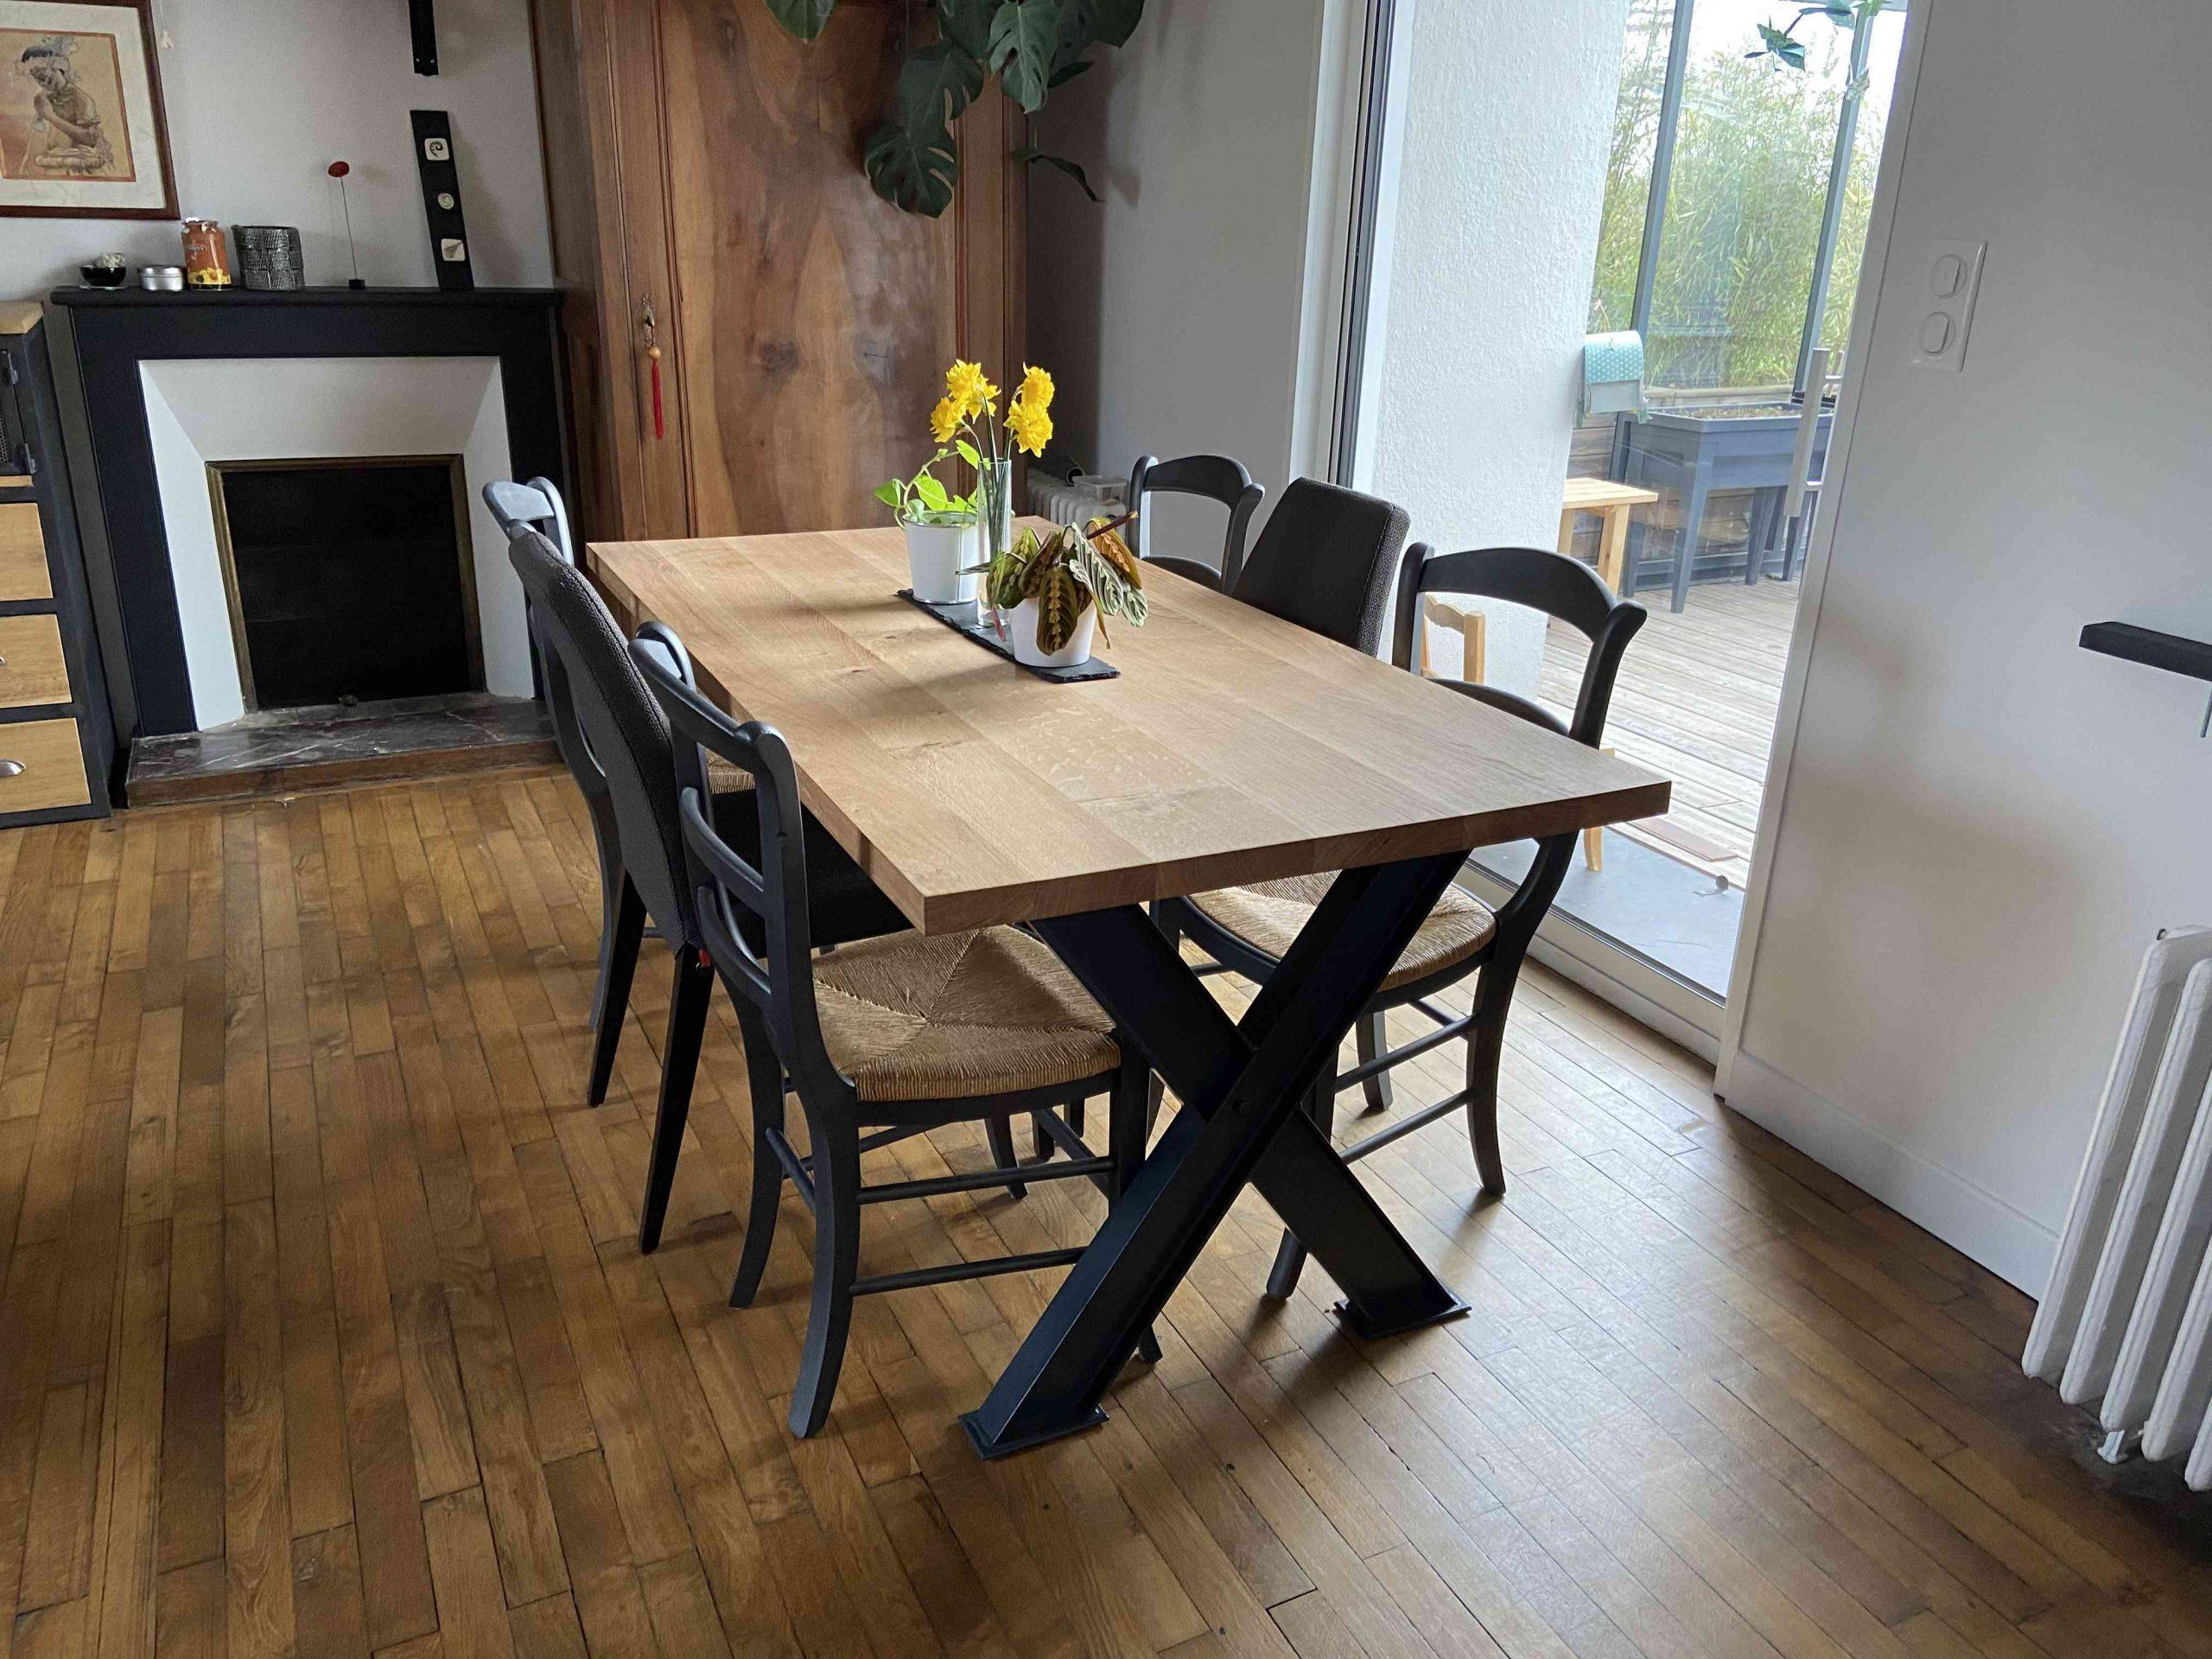 IMG 1860 1 scaled - Table de séjour chêne & métal